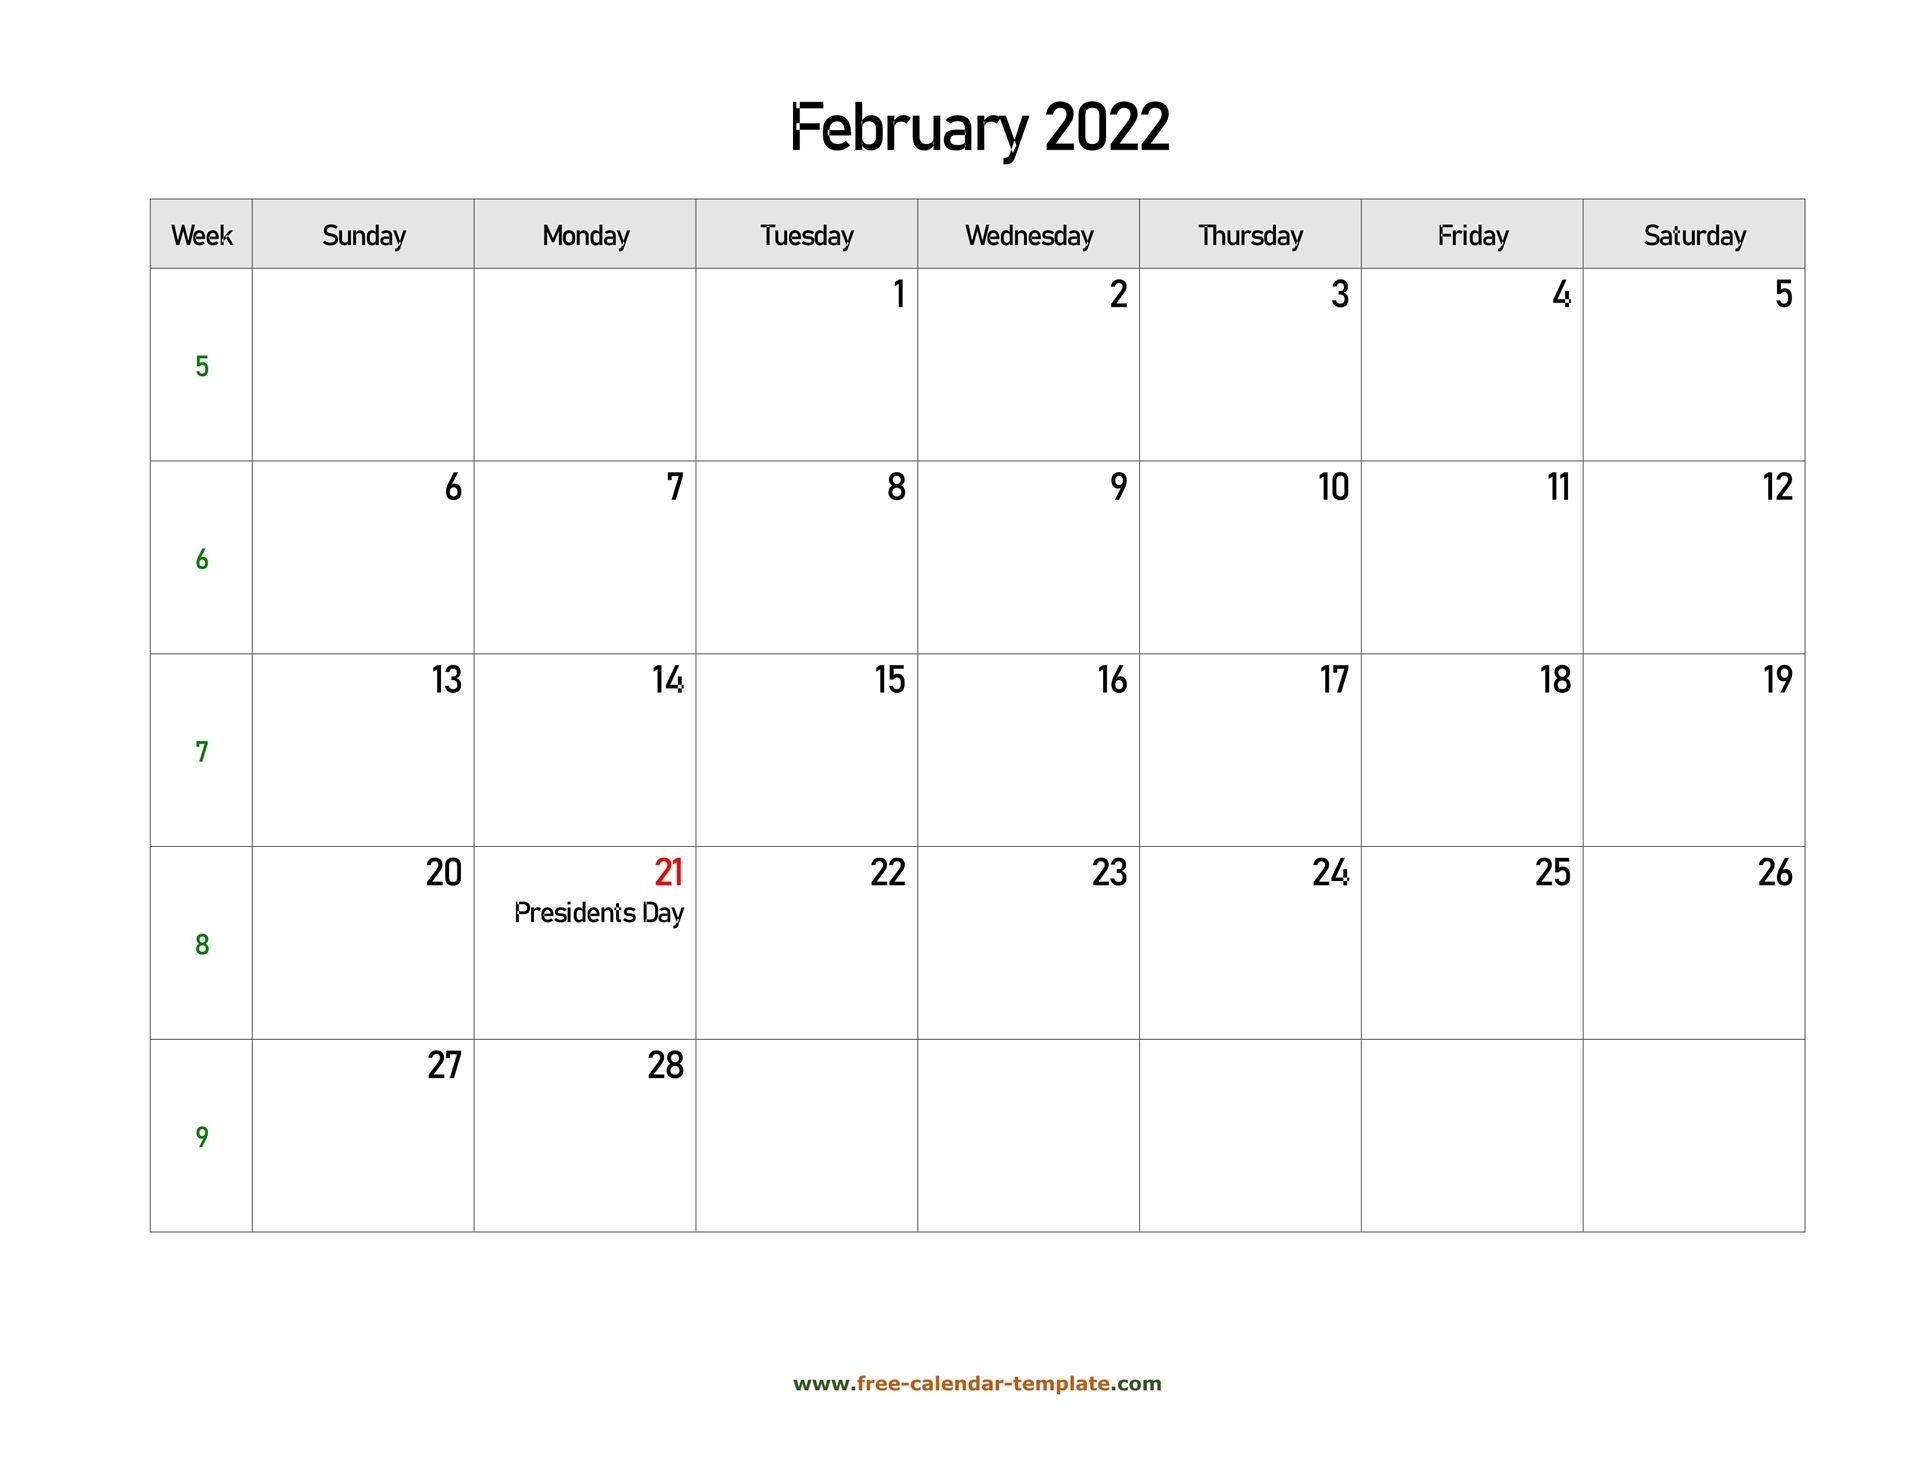 Free 2022 Calendar Blank February Template (Horizontal